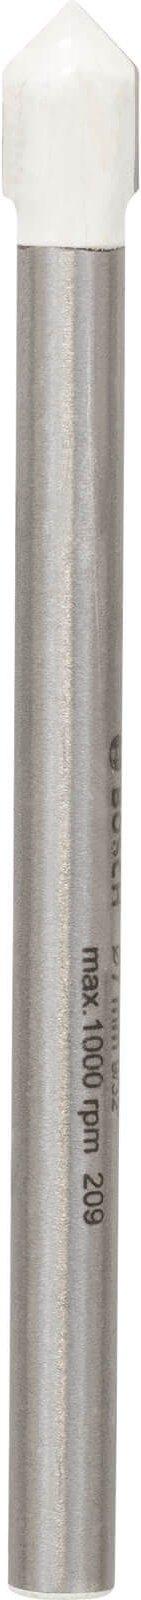 Bosch Ceramic Tile Drill Bit 7mm